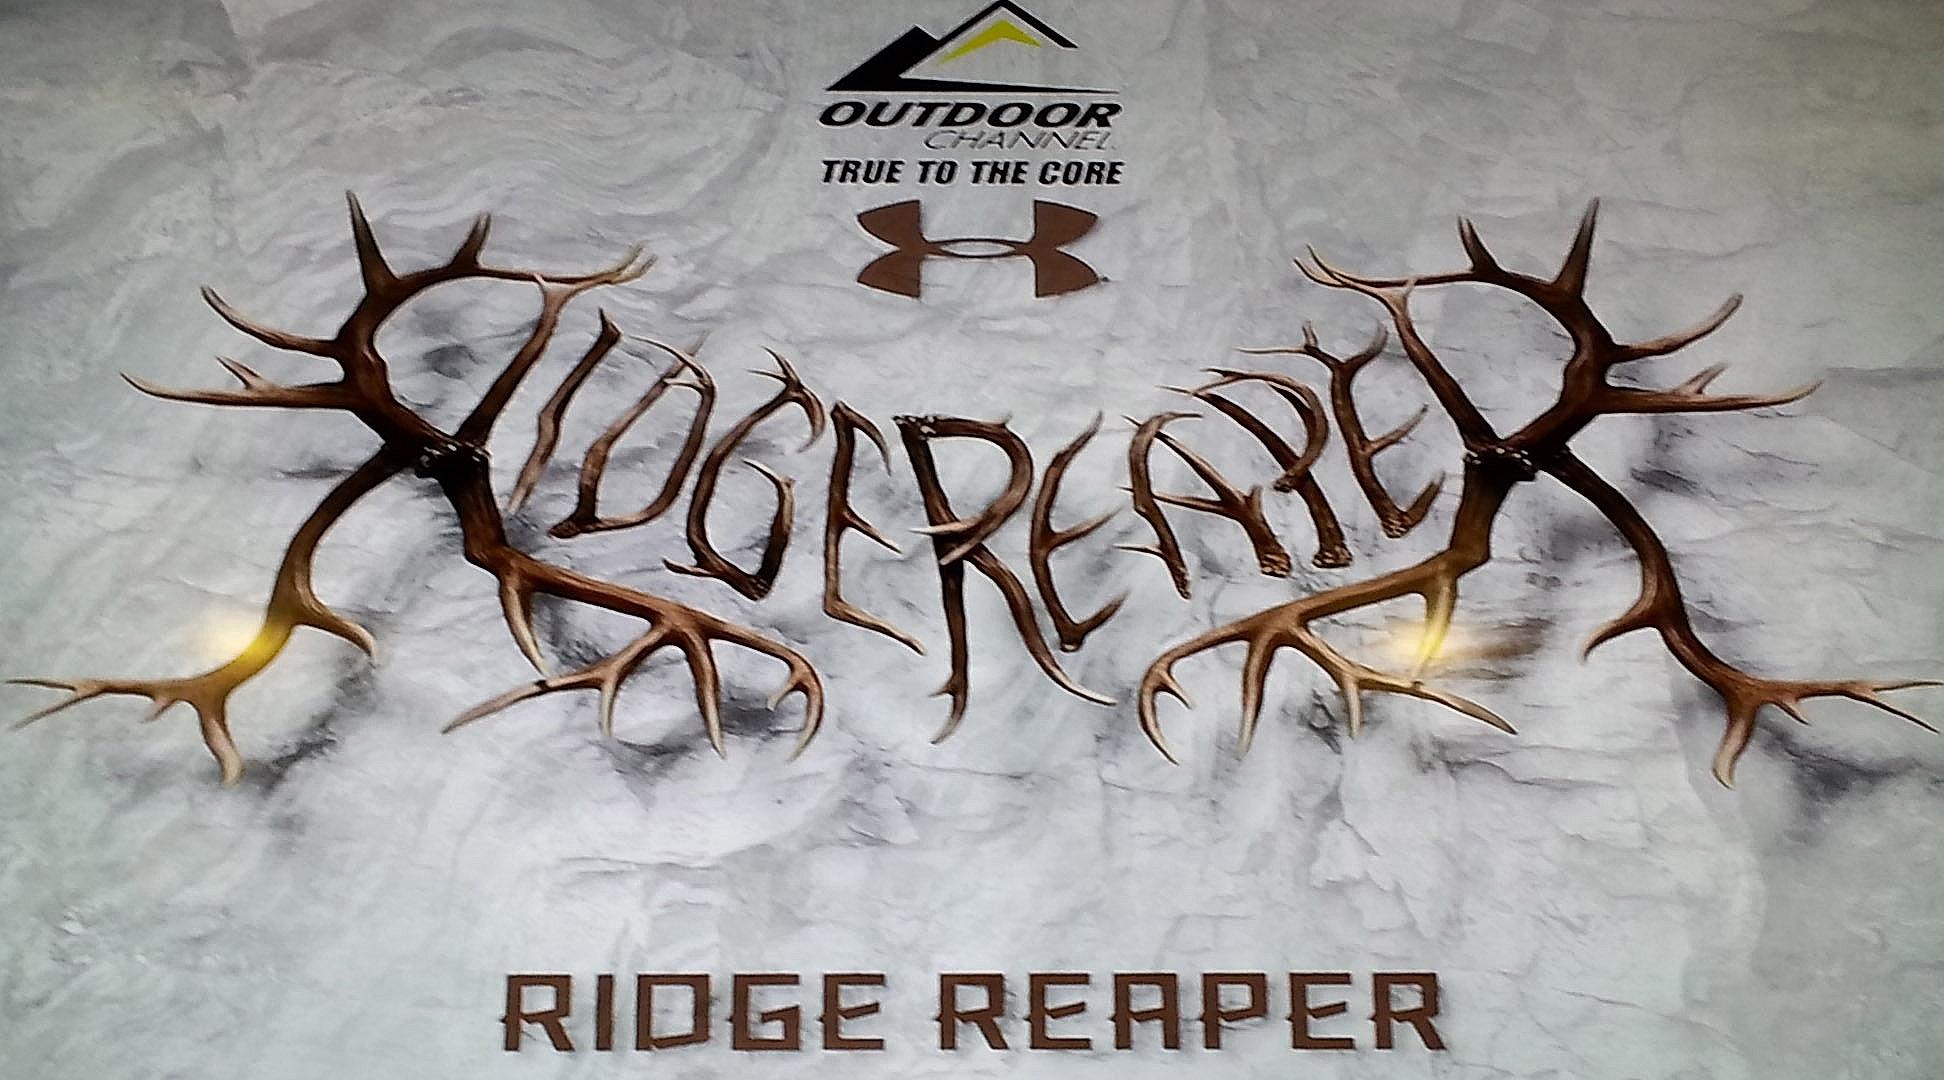 bmf exclusive: inside under armour headquarters & 'ridge reaper